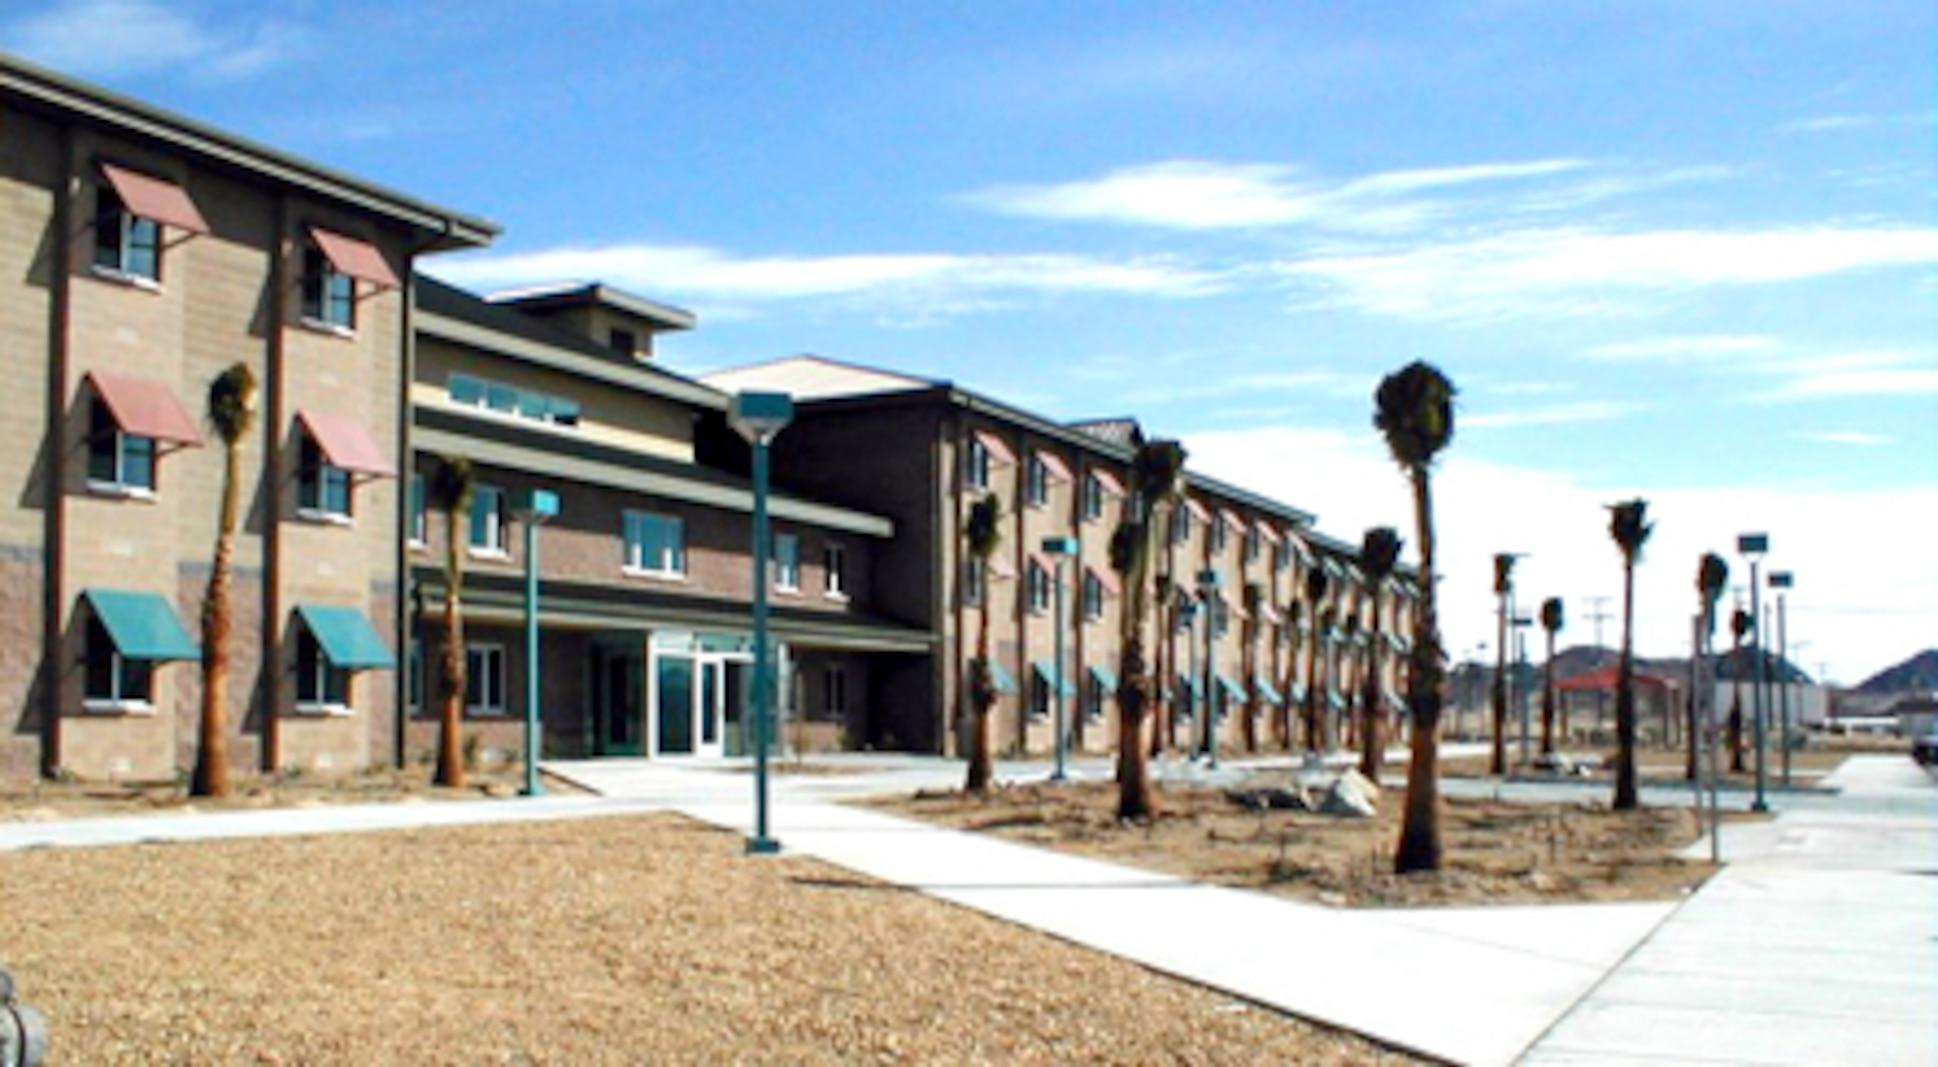 Bachelor Housing 29 Palms, California